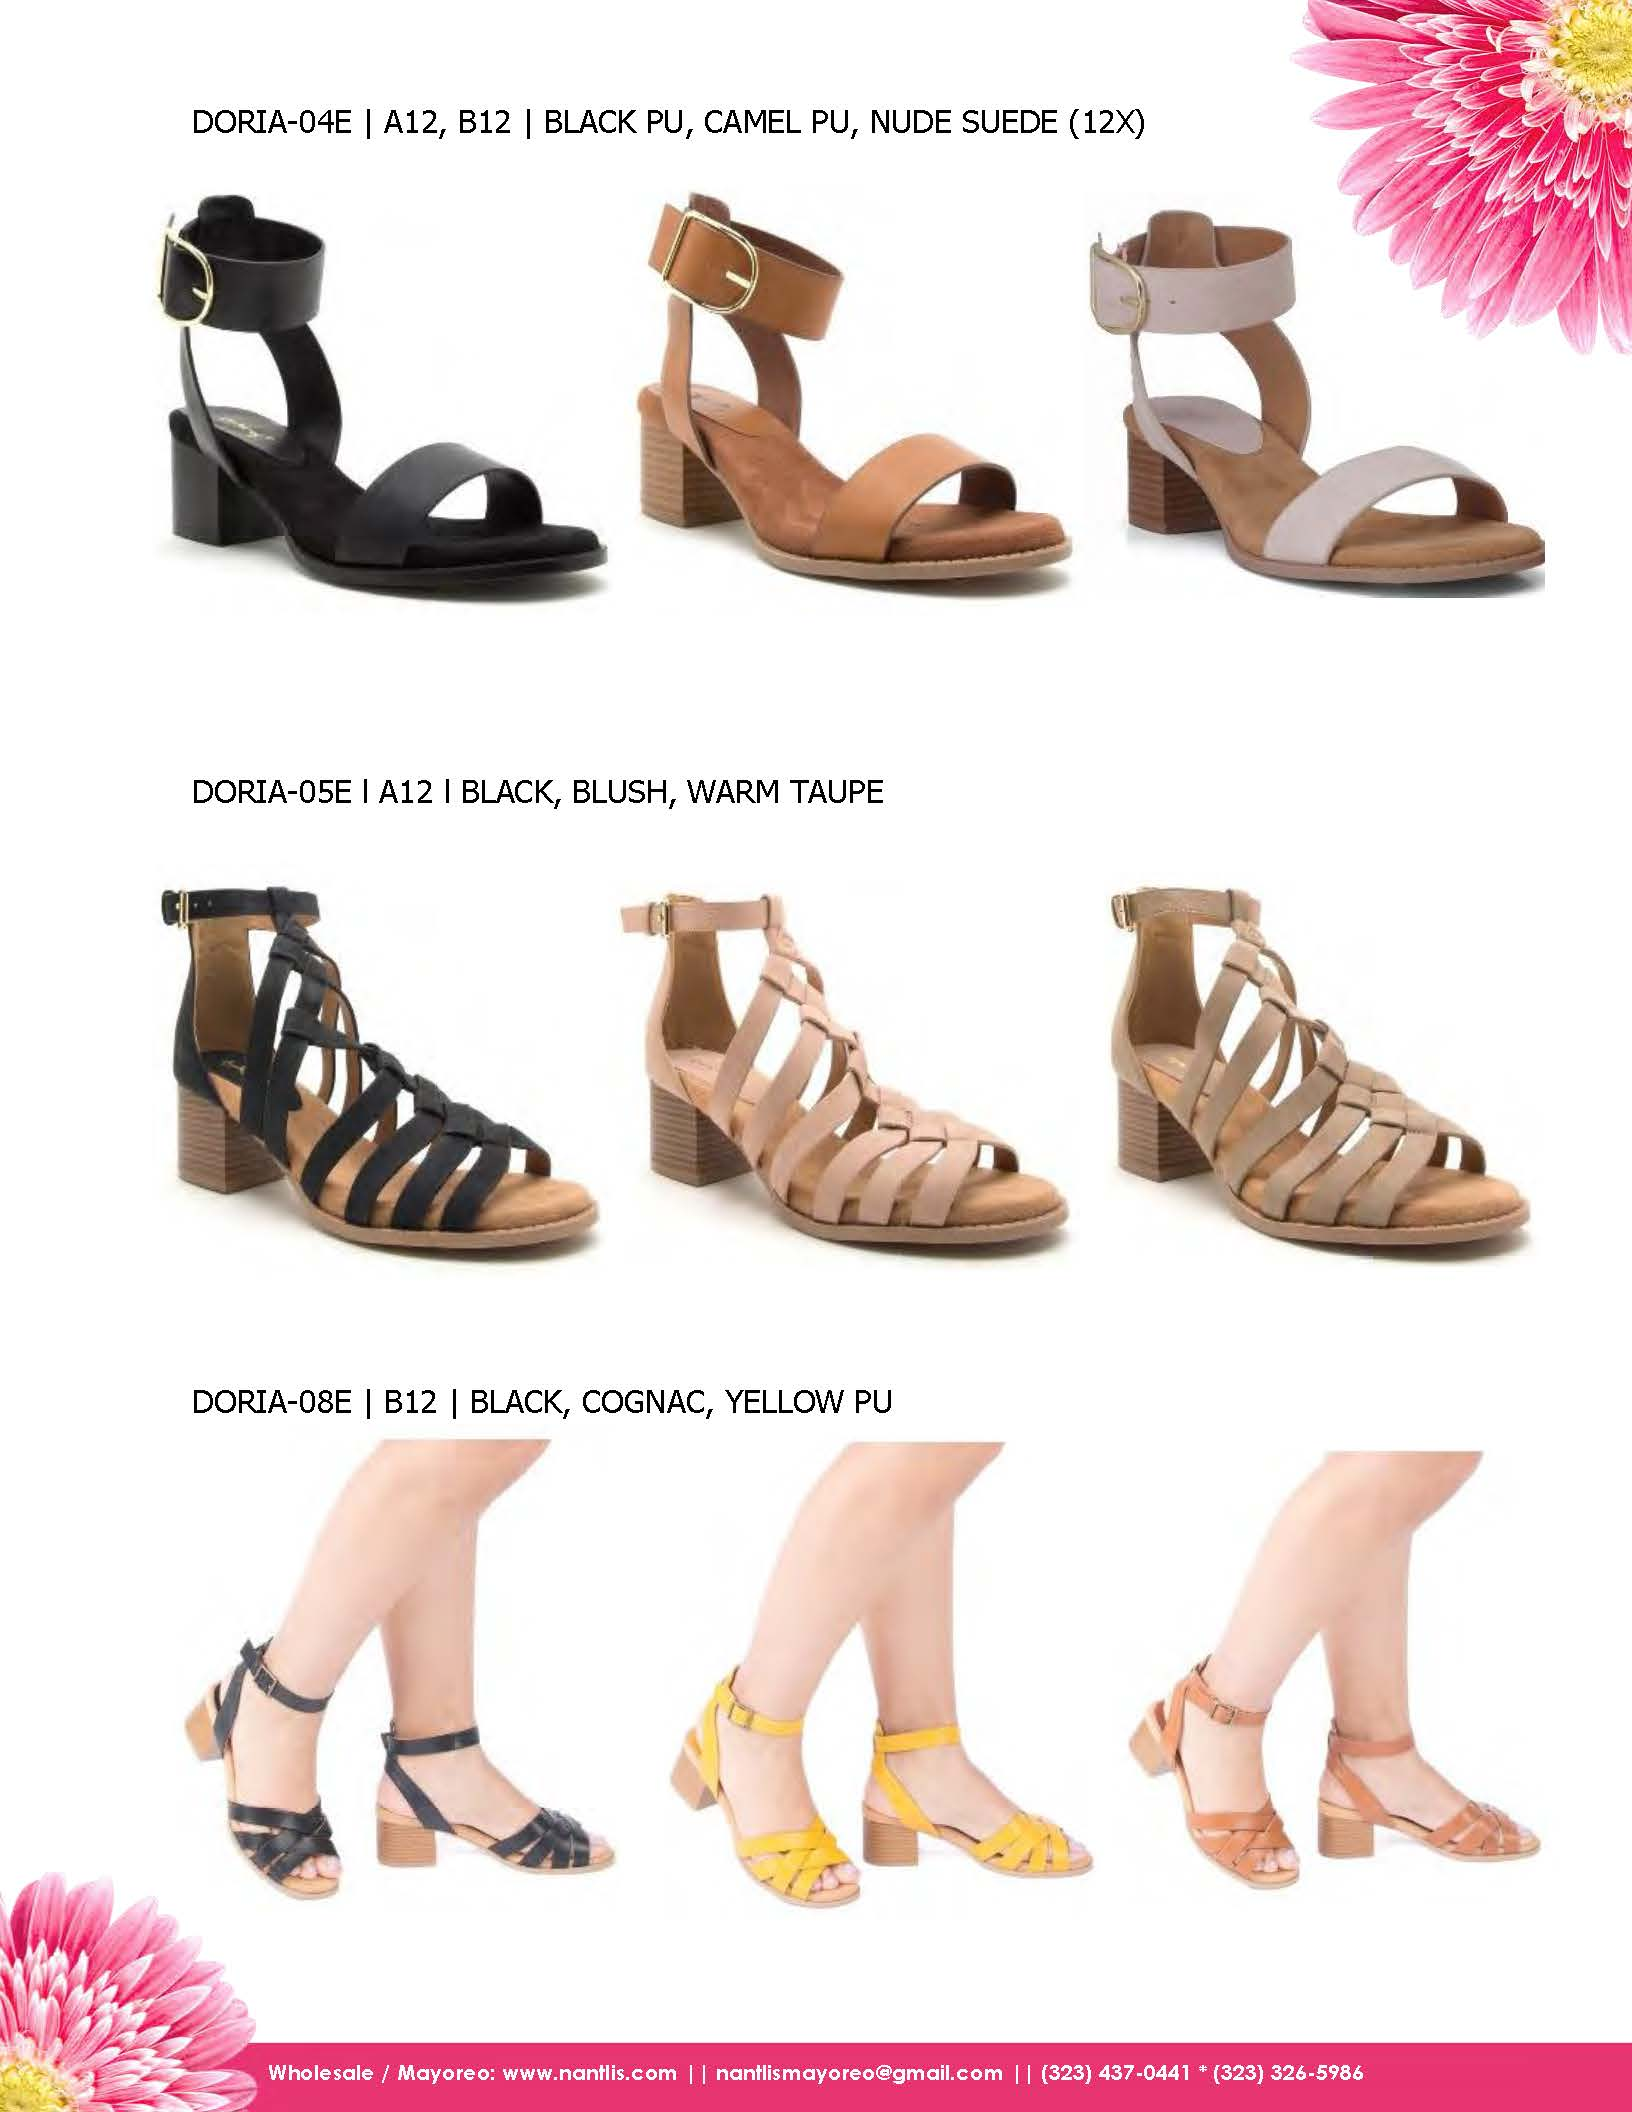 Nantlis Vol QU43 Zapatos para mujer mayoreo Wholesale shoes for women_Page_19